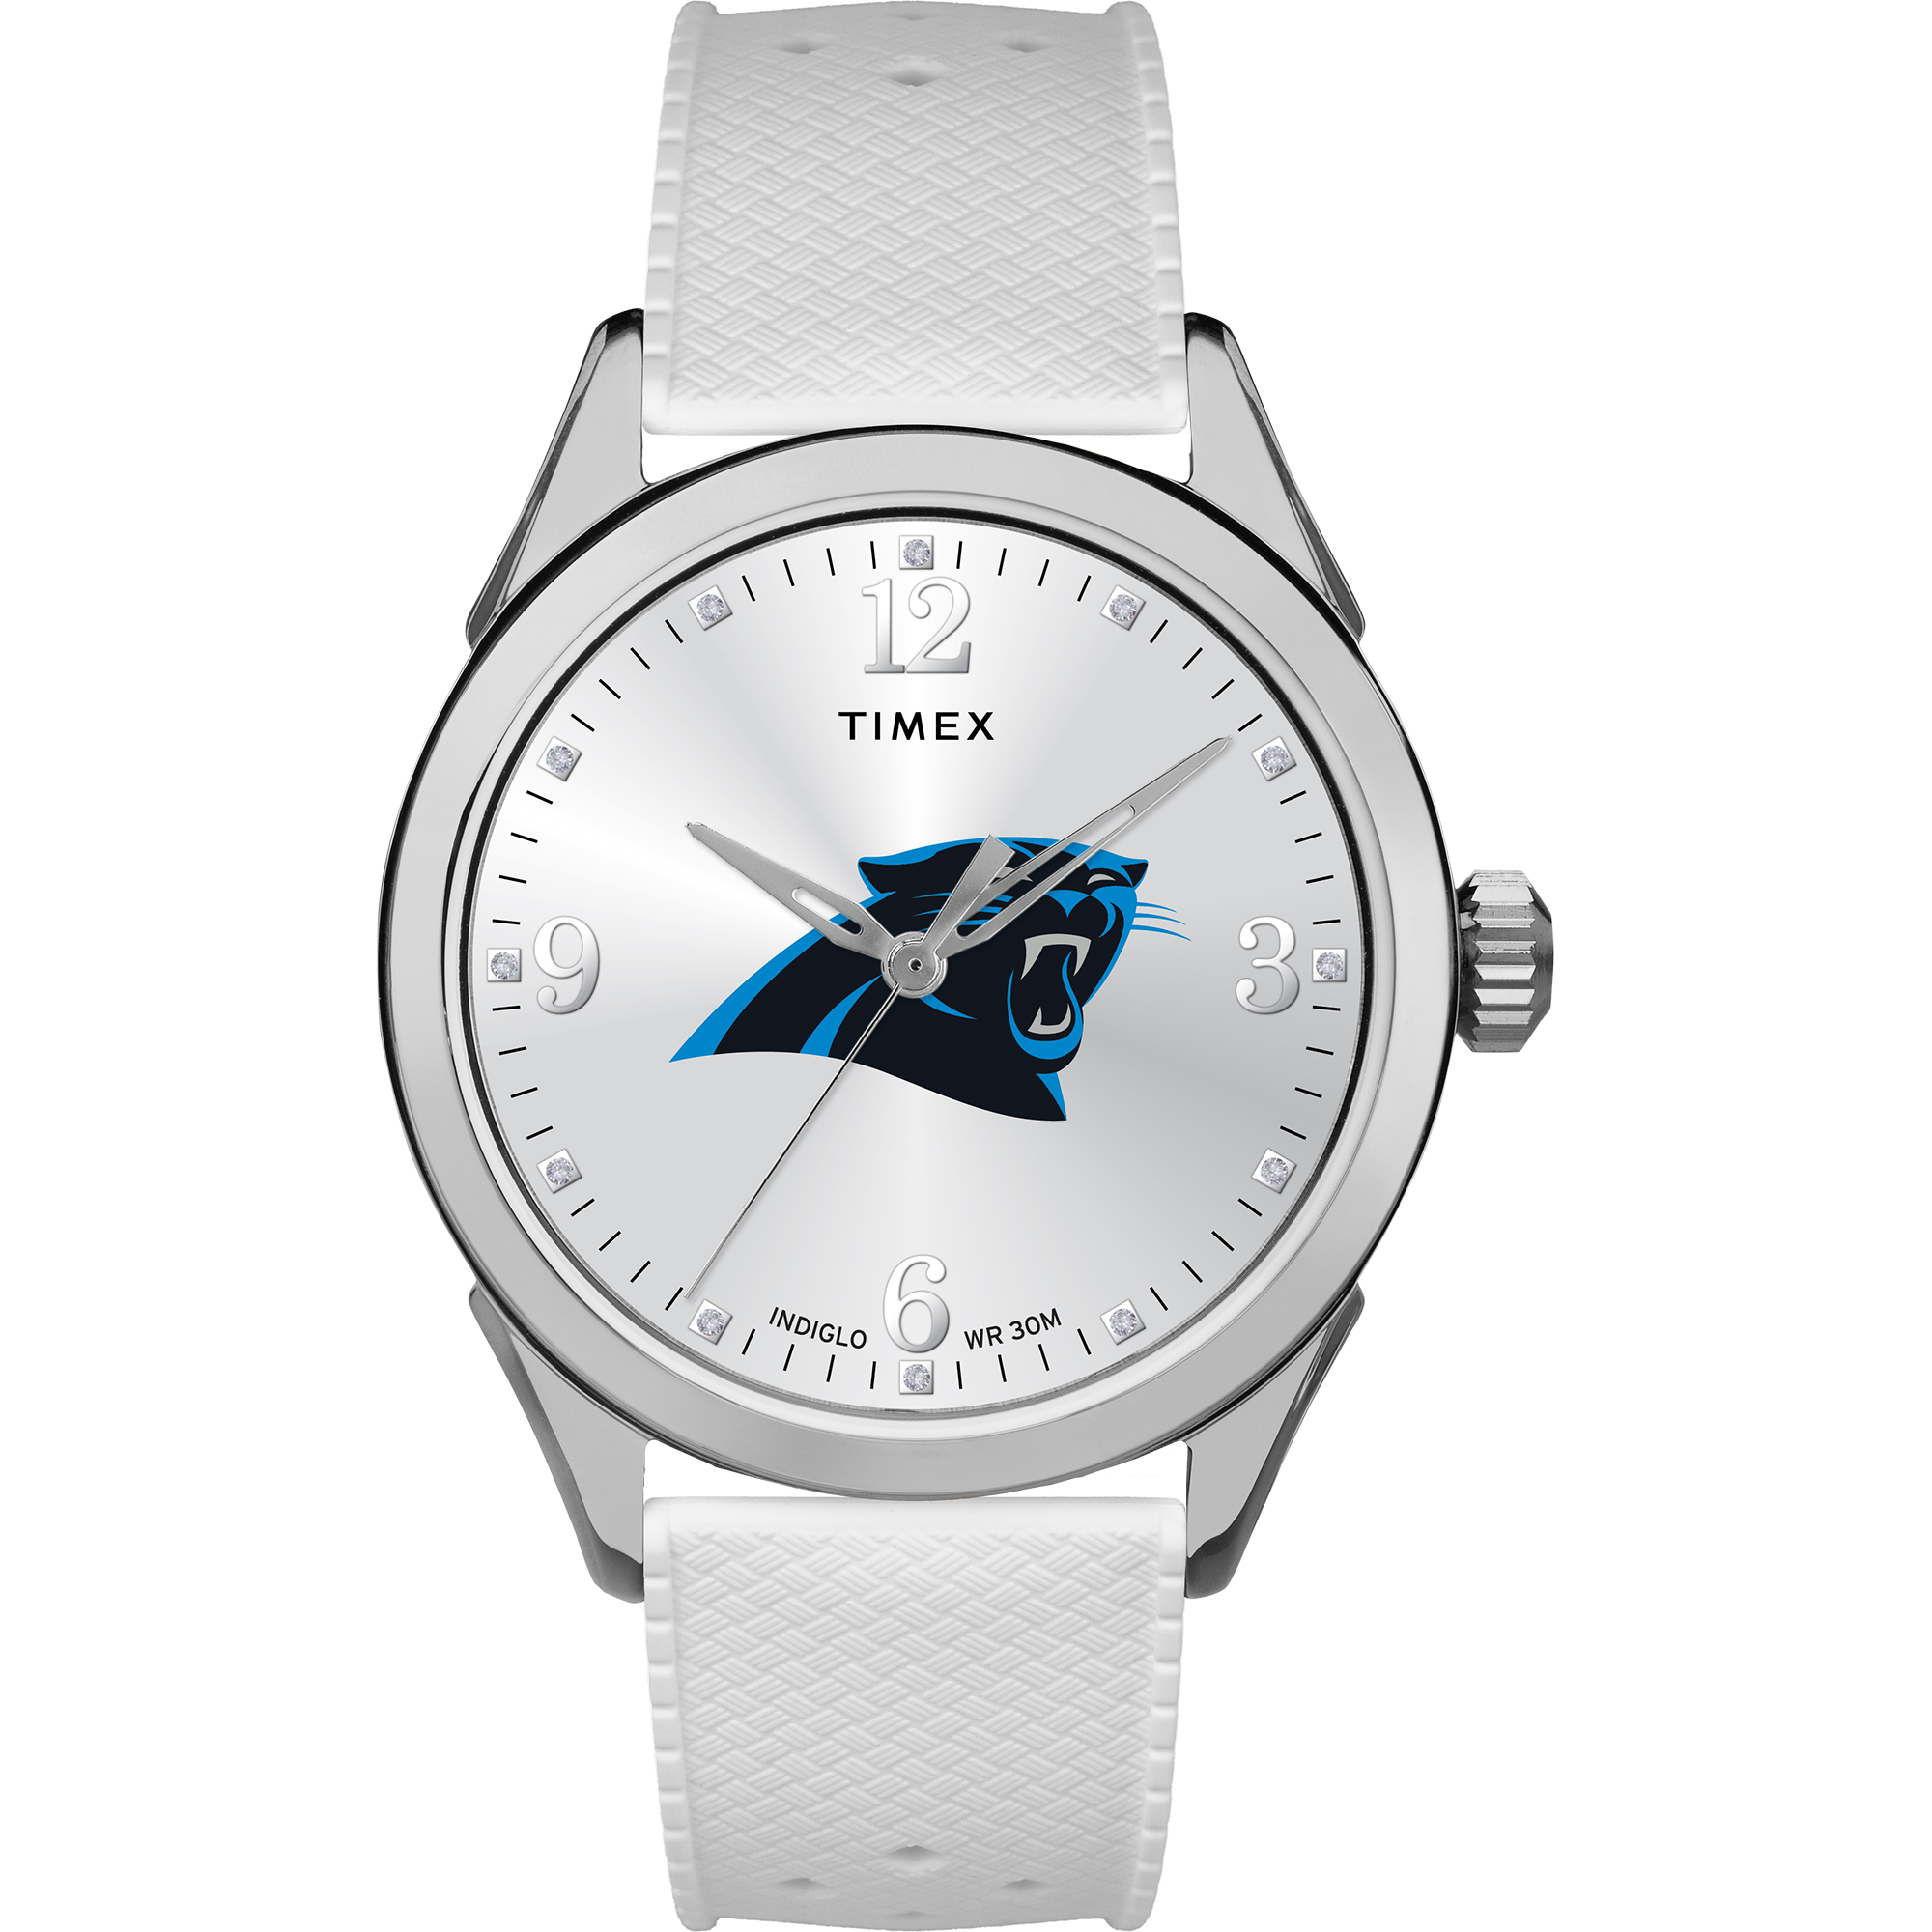 Timex - NFL Tribute Collection Athena Women's Watch, Carolina Panthers